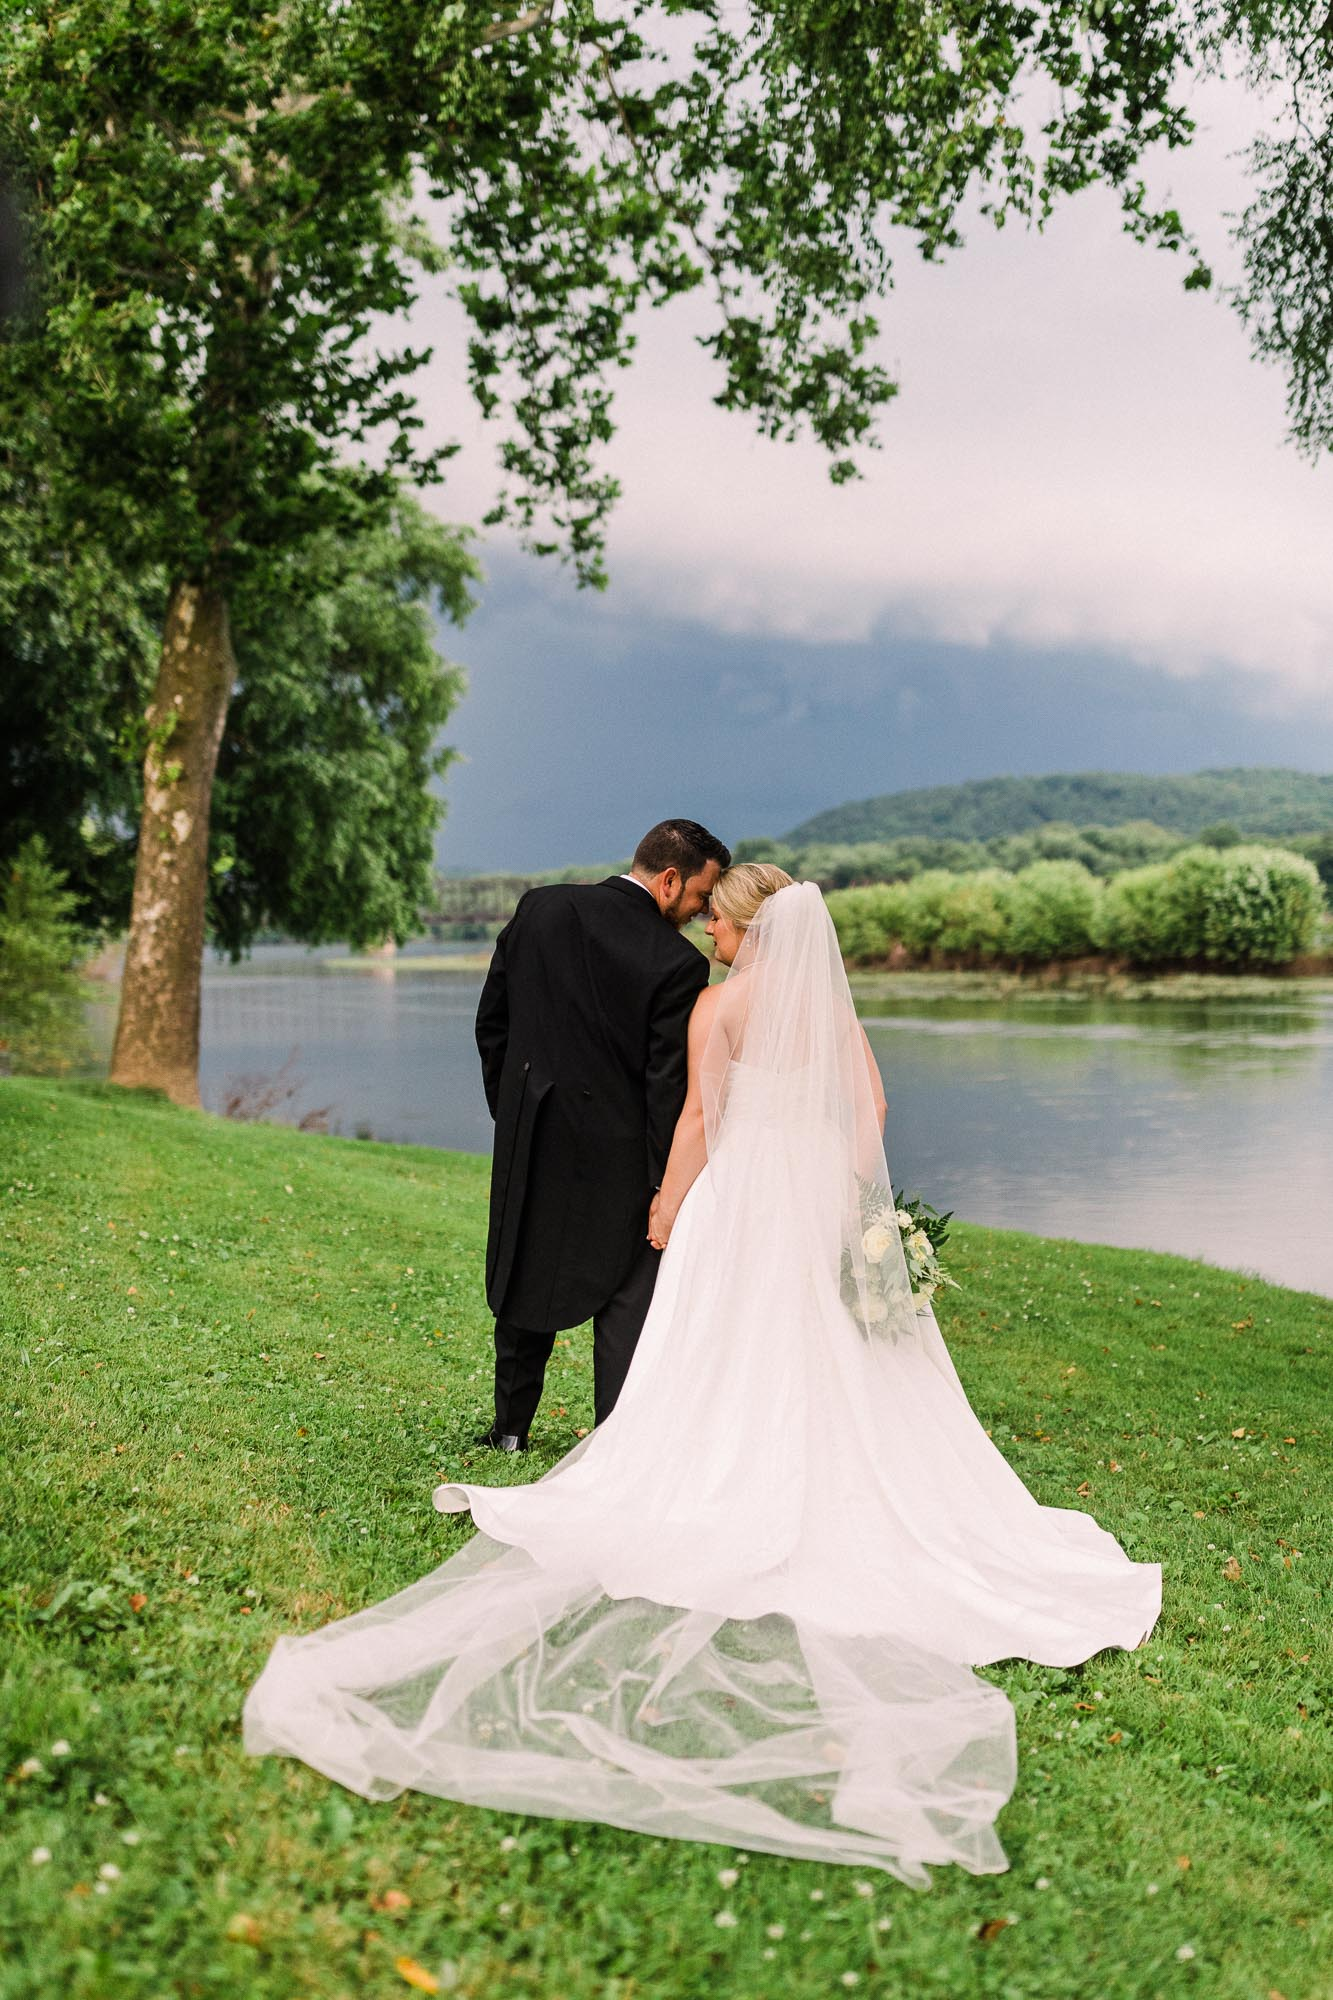 isle-of-que-wedding-6964.jpg